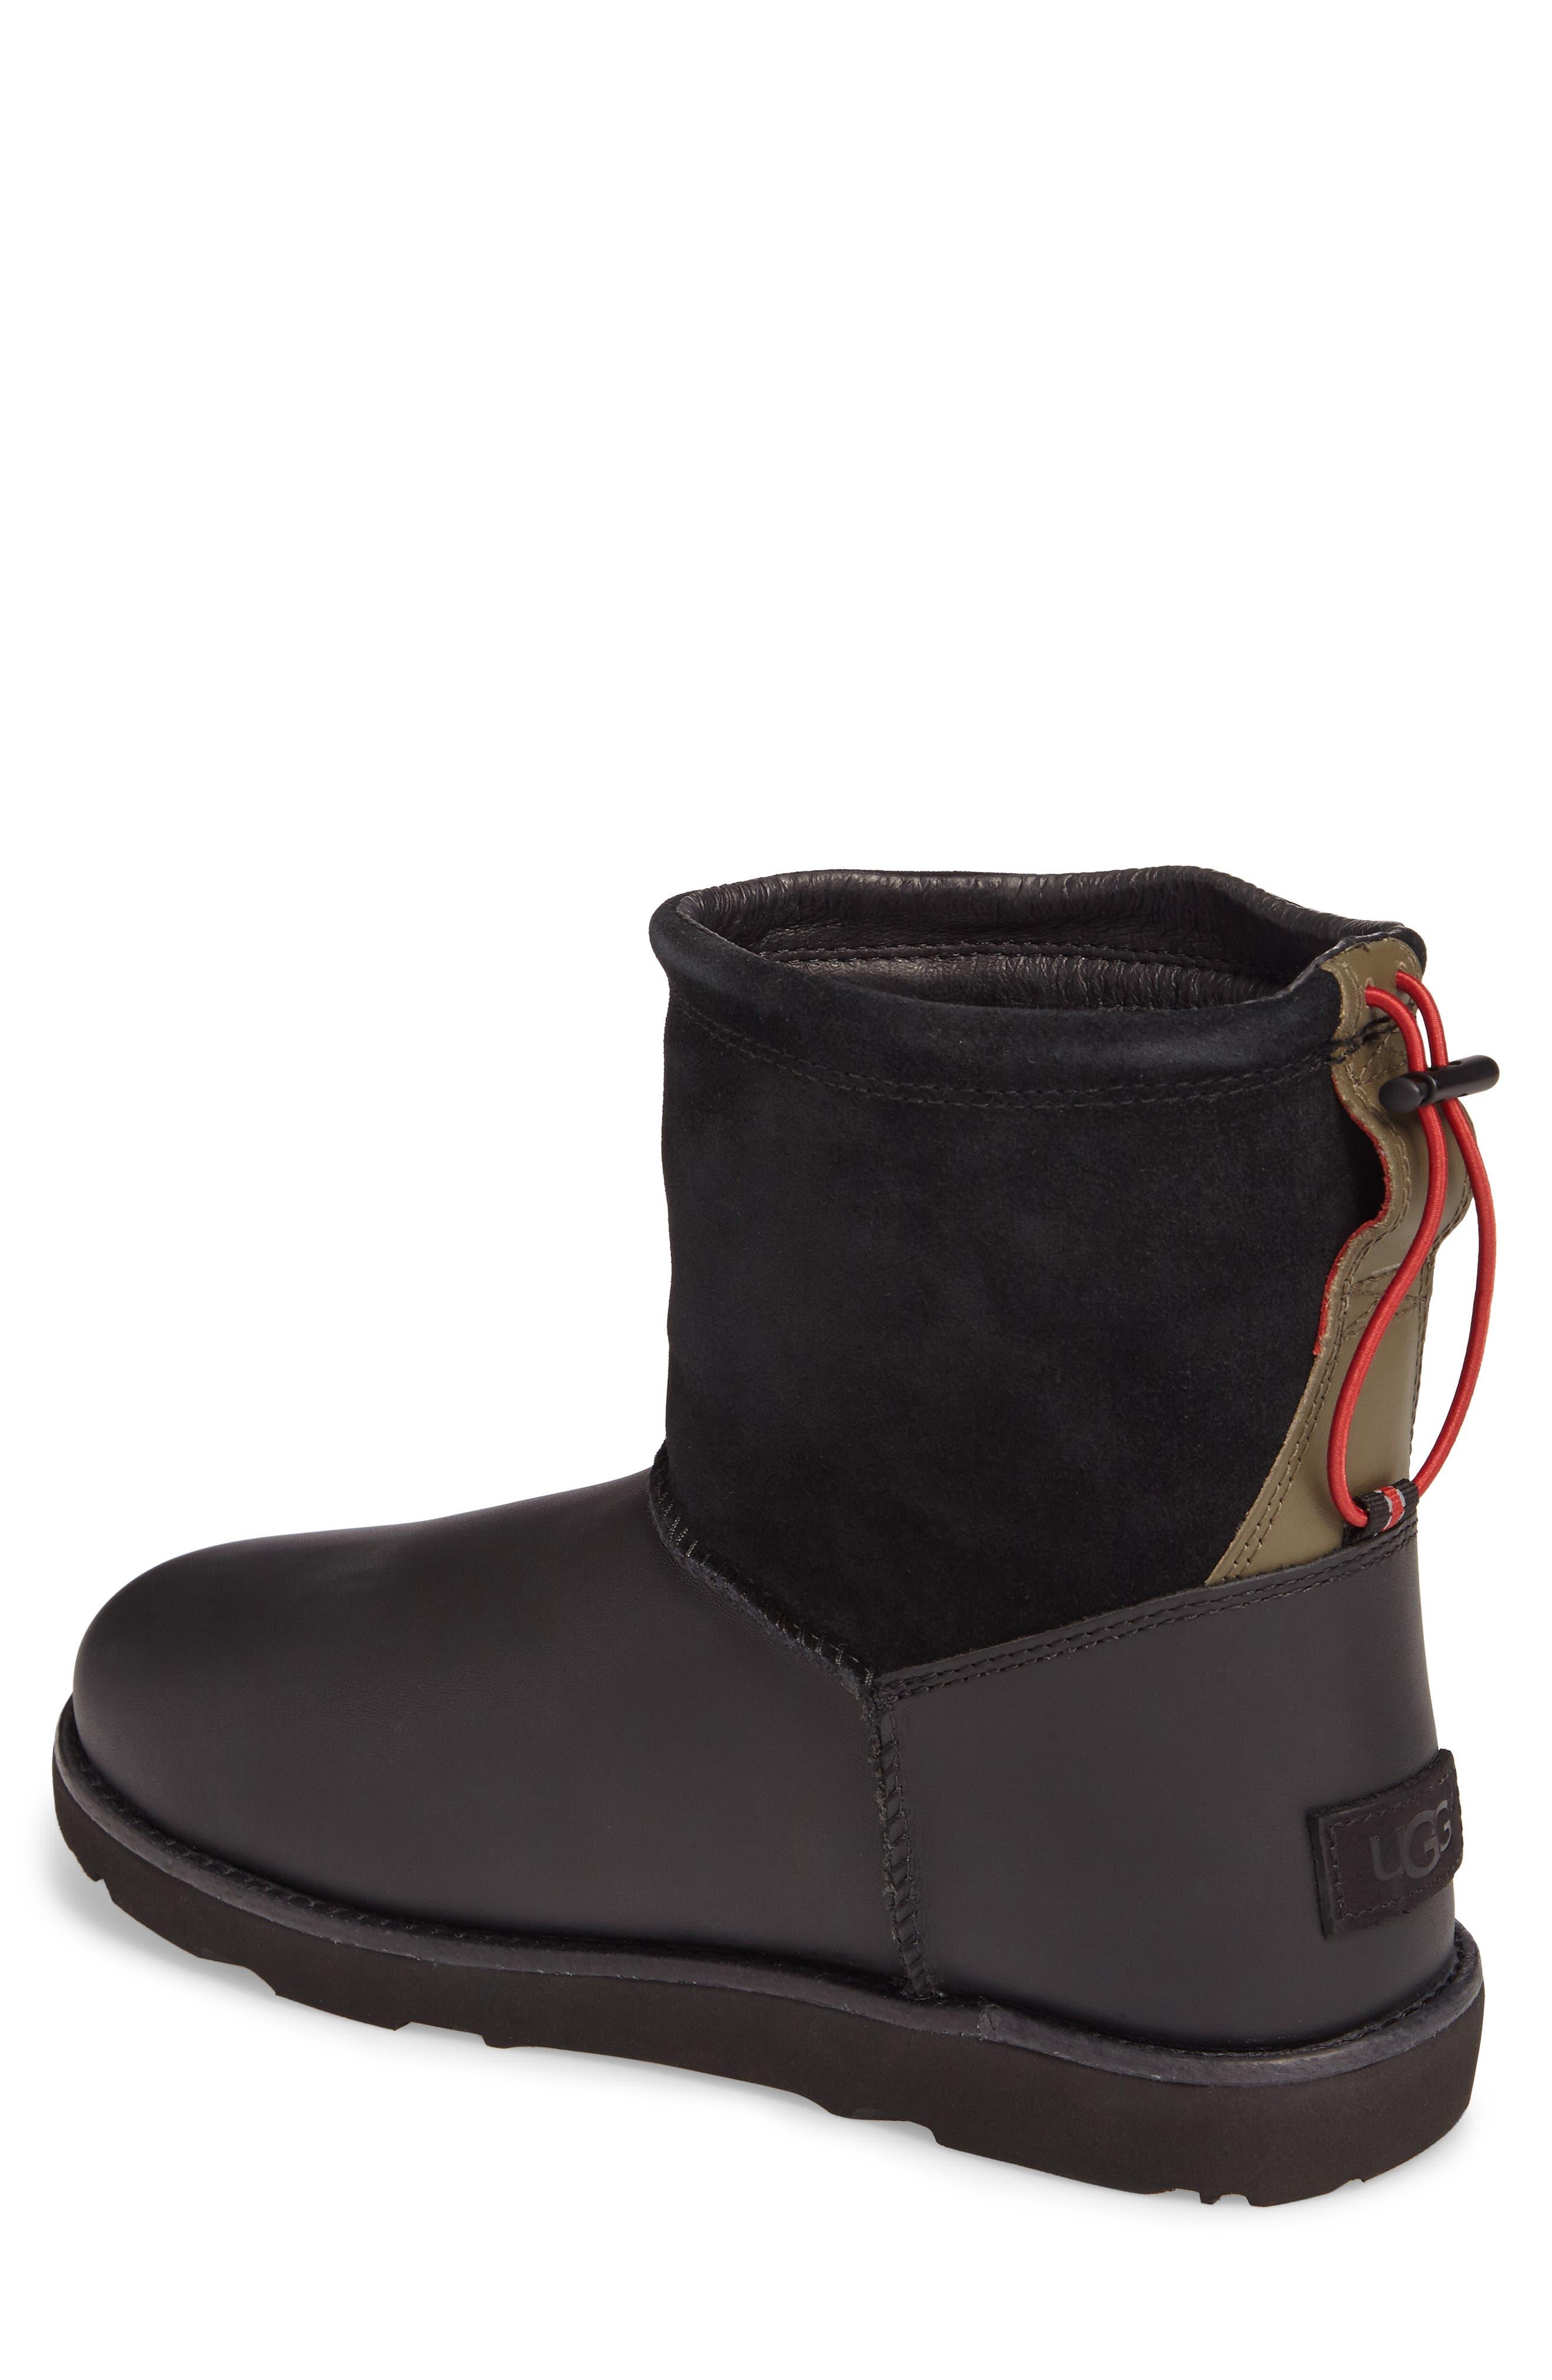 Classic Waterproof Boot,                             Alternate thumbnail 2, color,                             Black